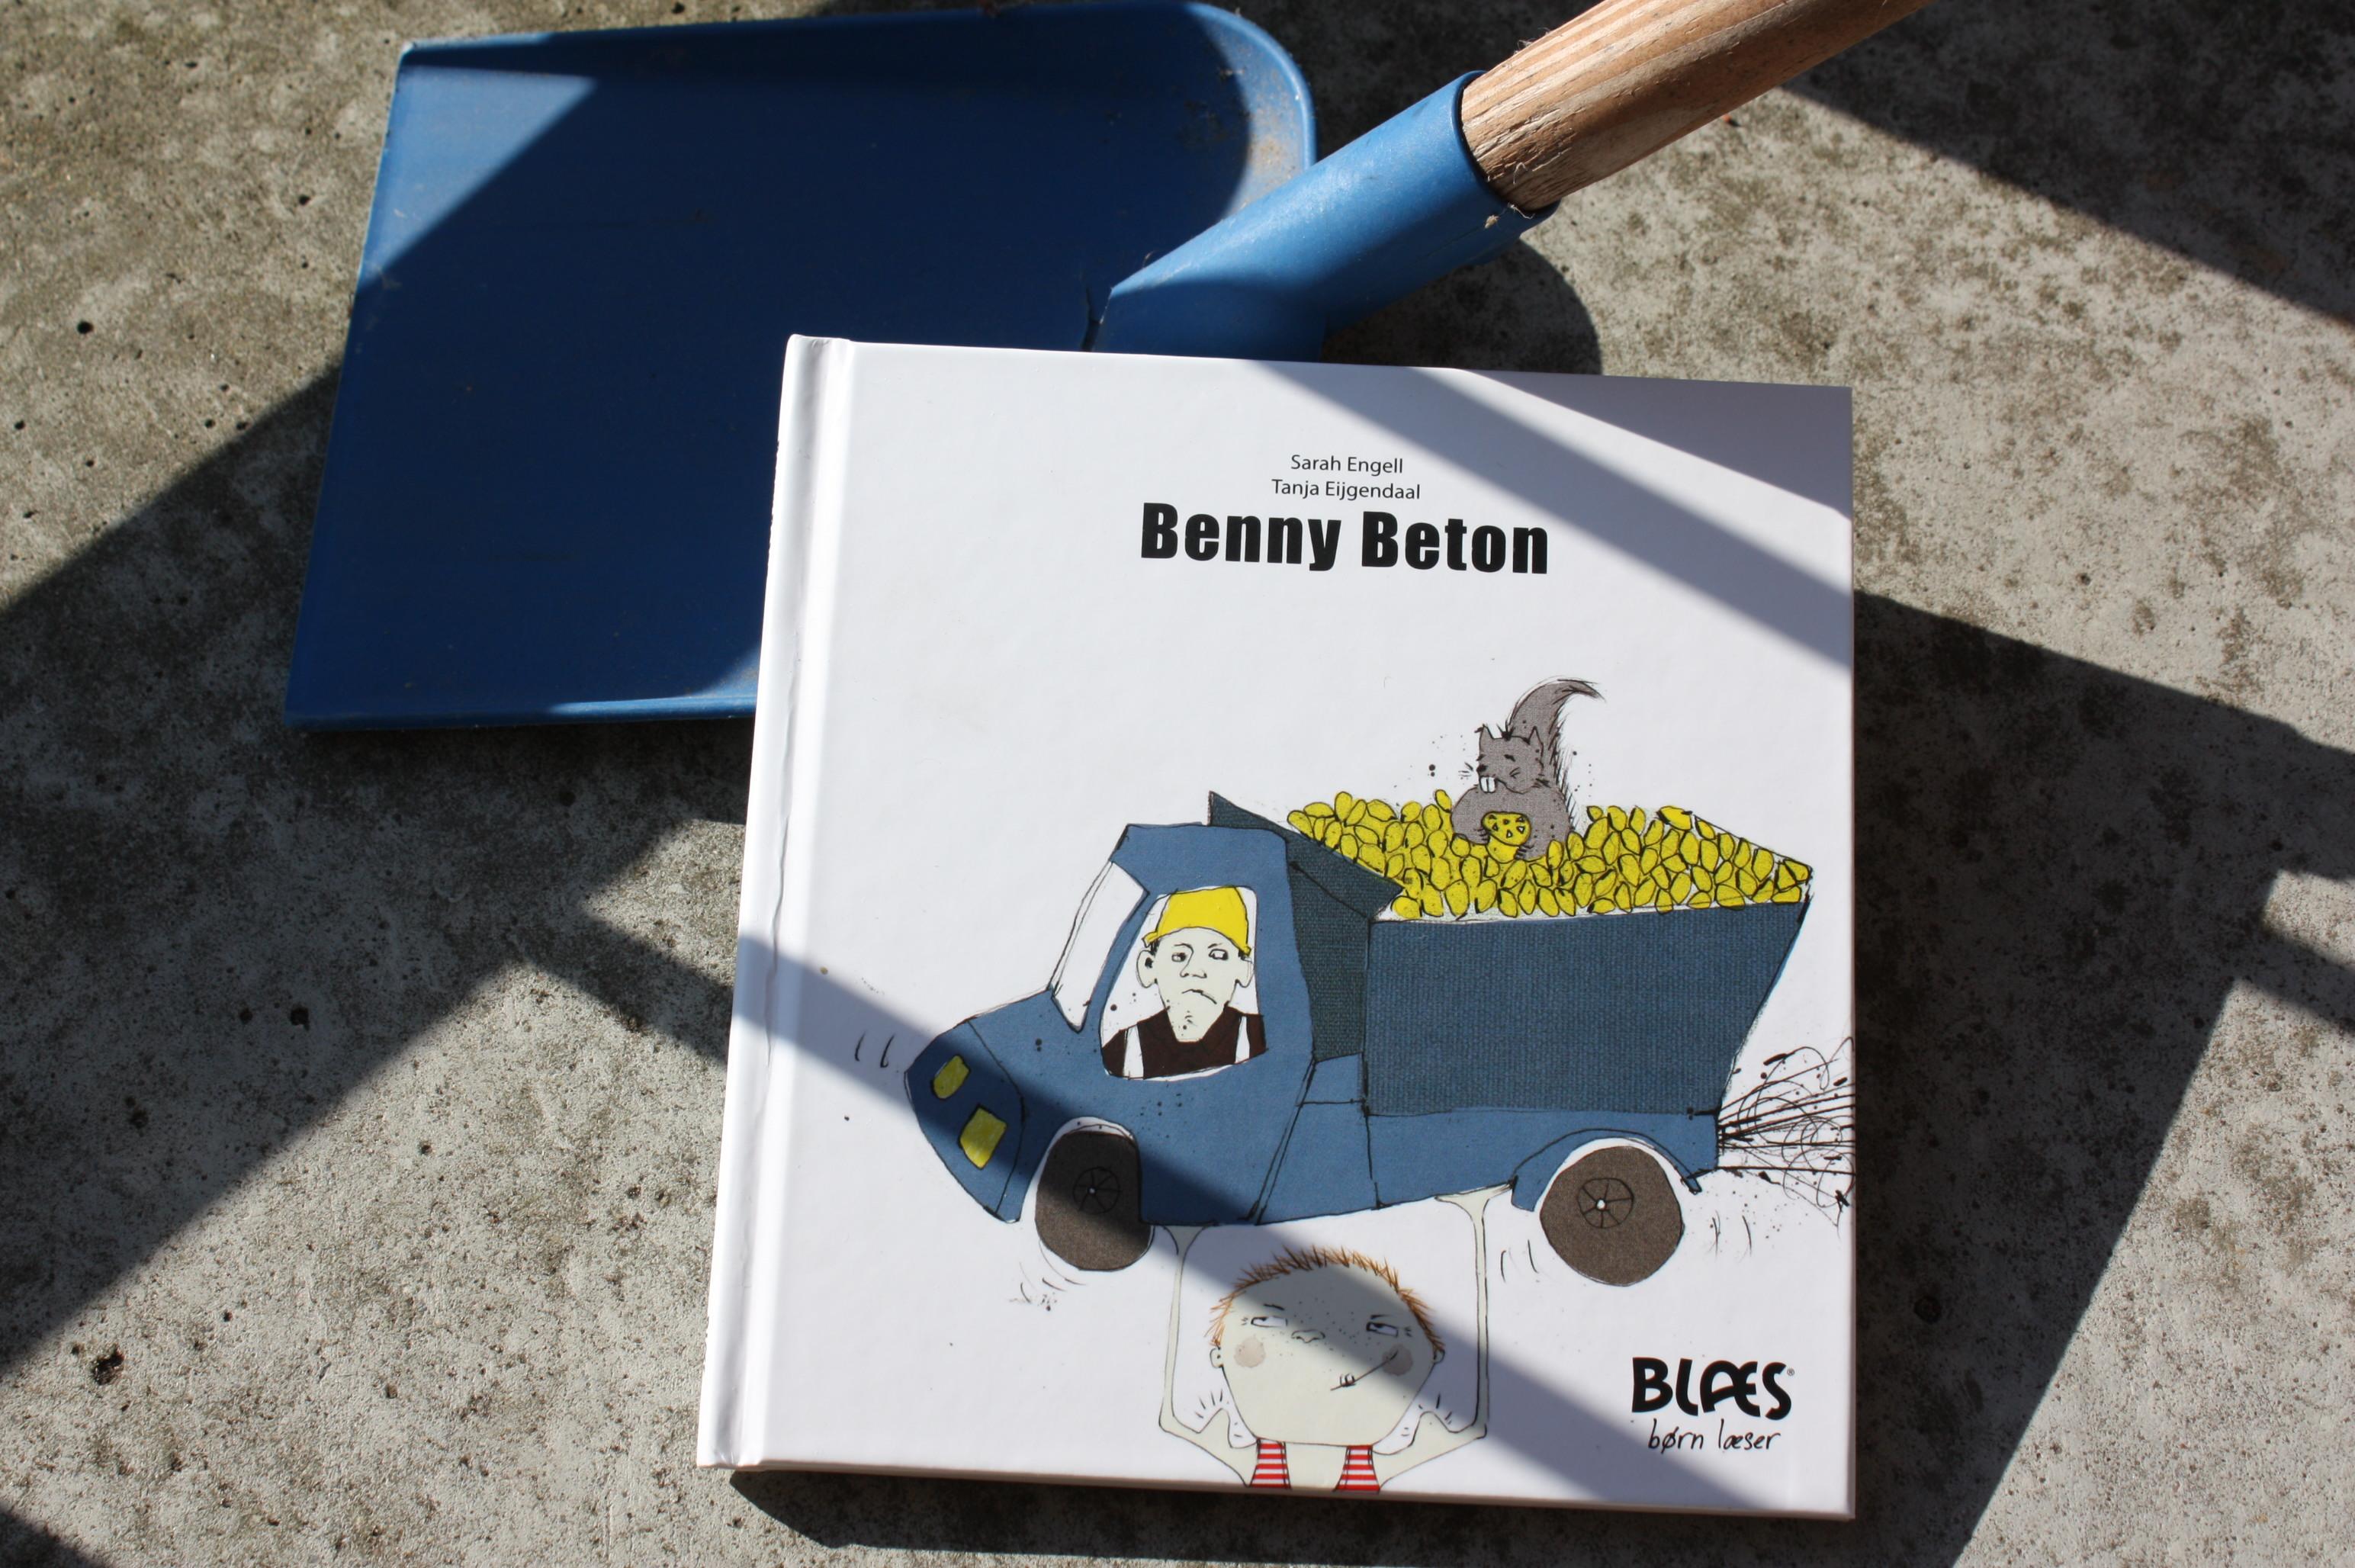 Benny Beton